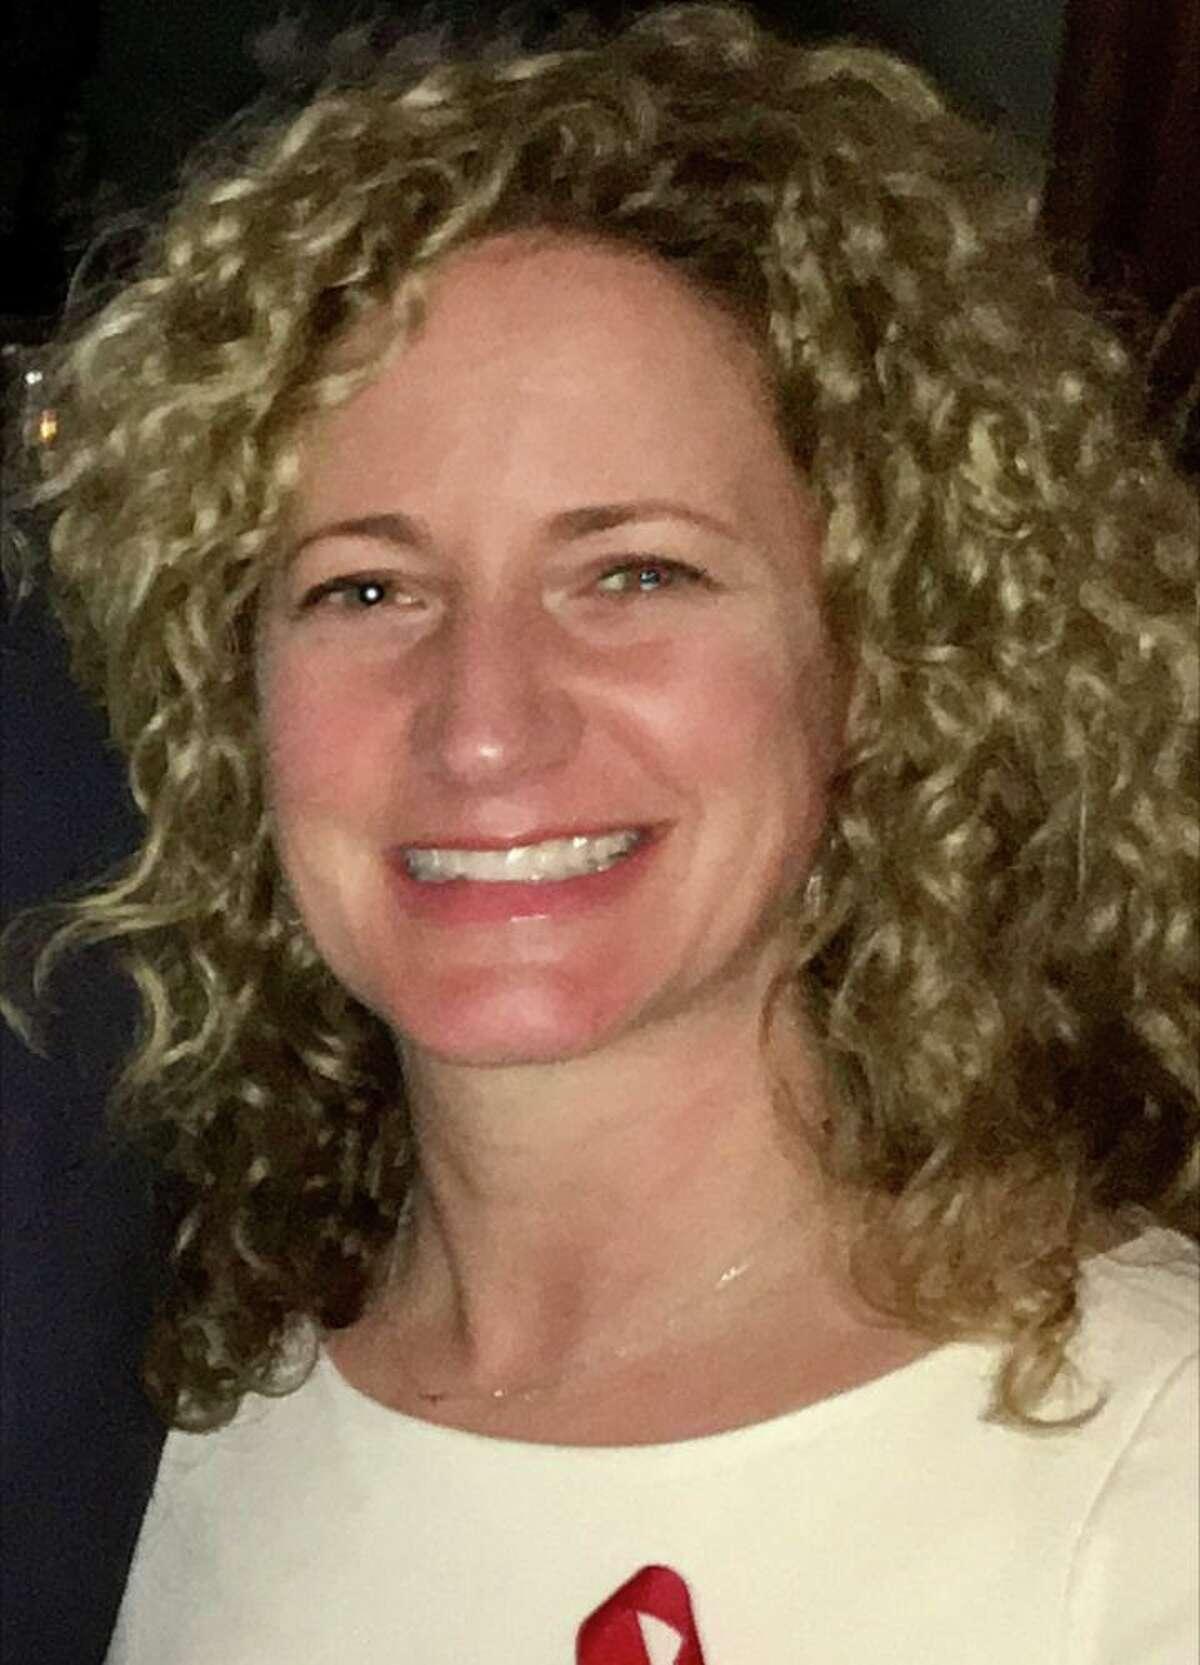 Elaine Daignault, Westport director of human services